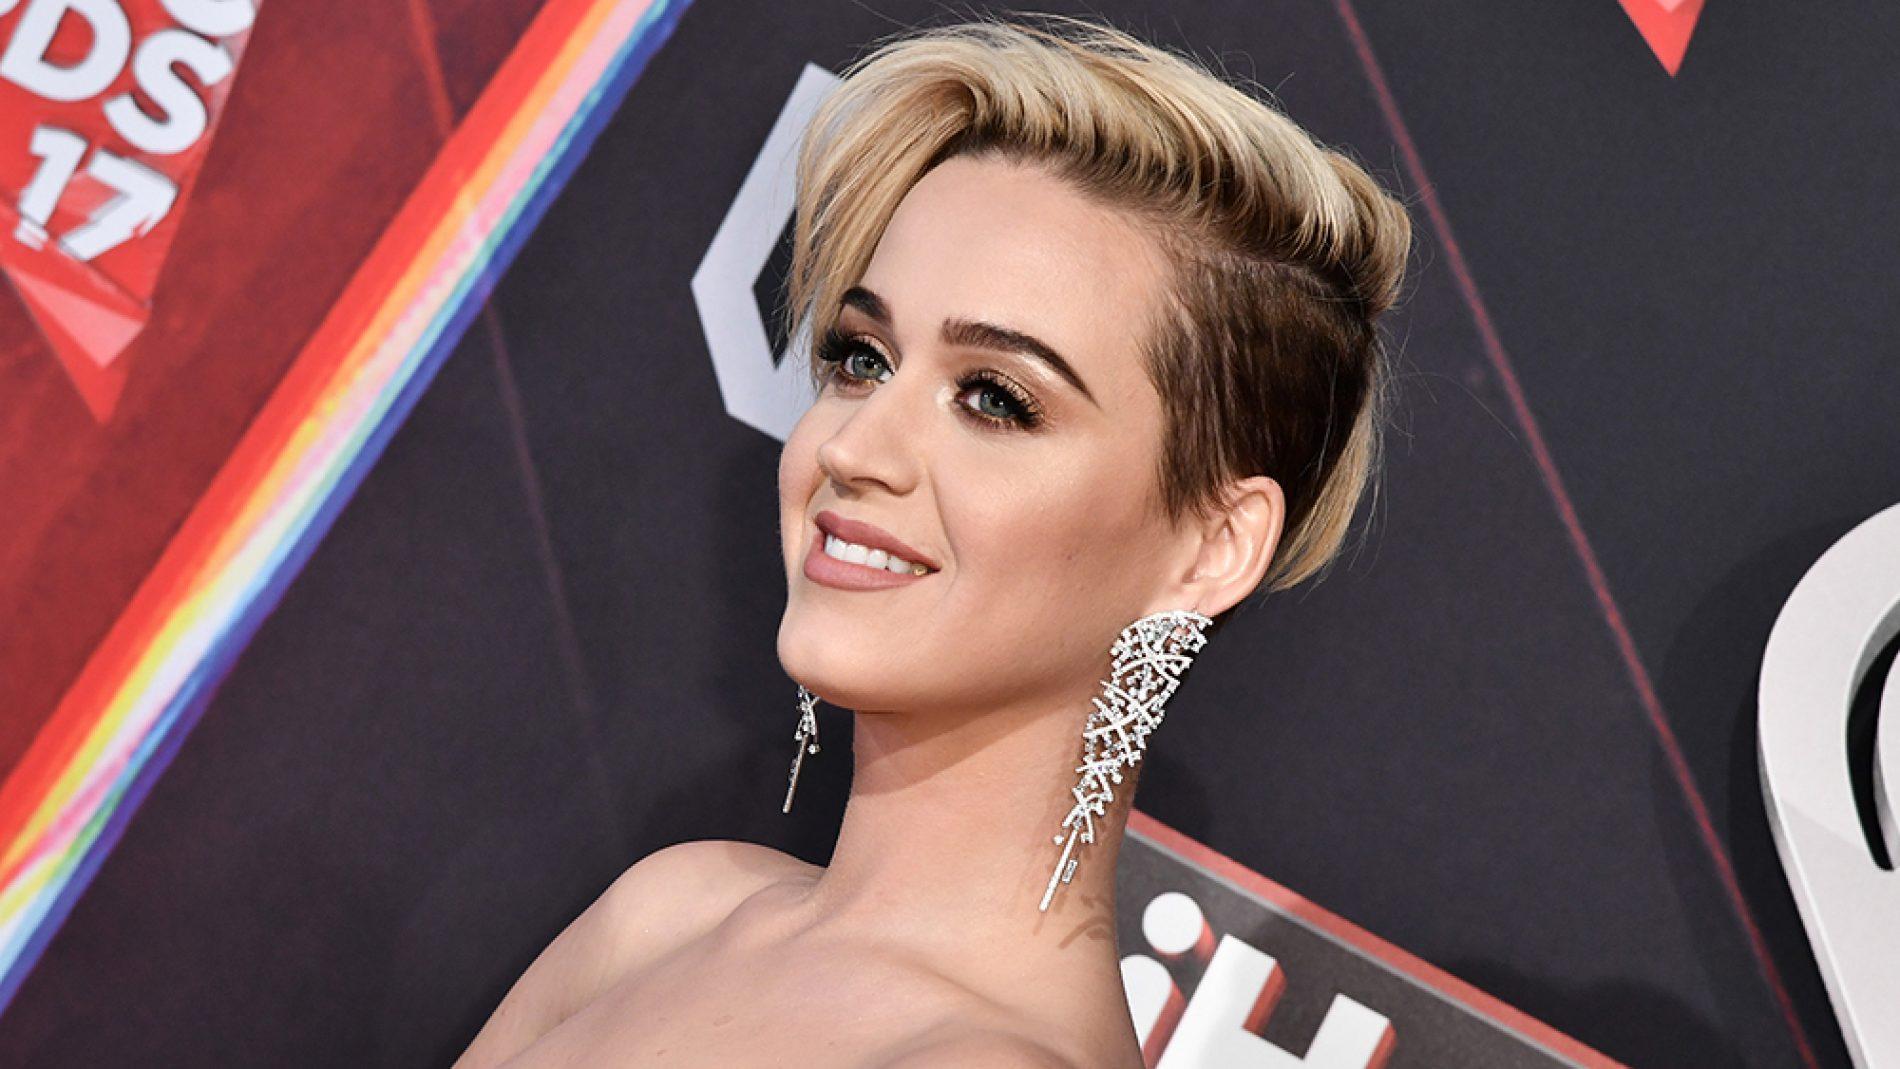 Katy Perry has found Jesus again?